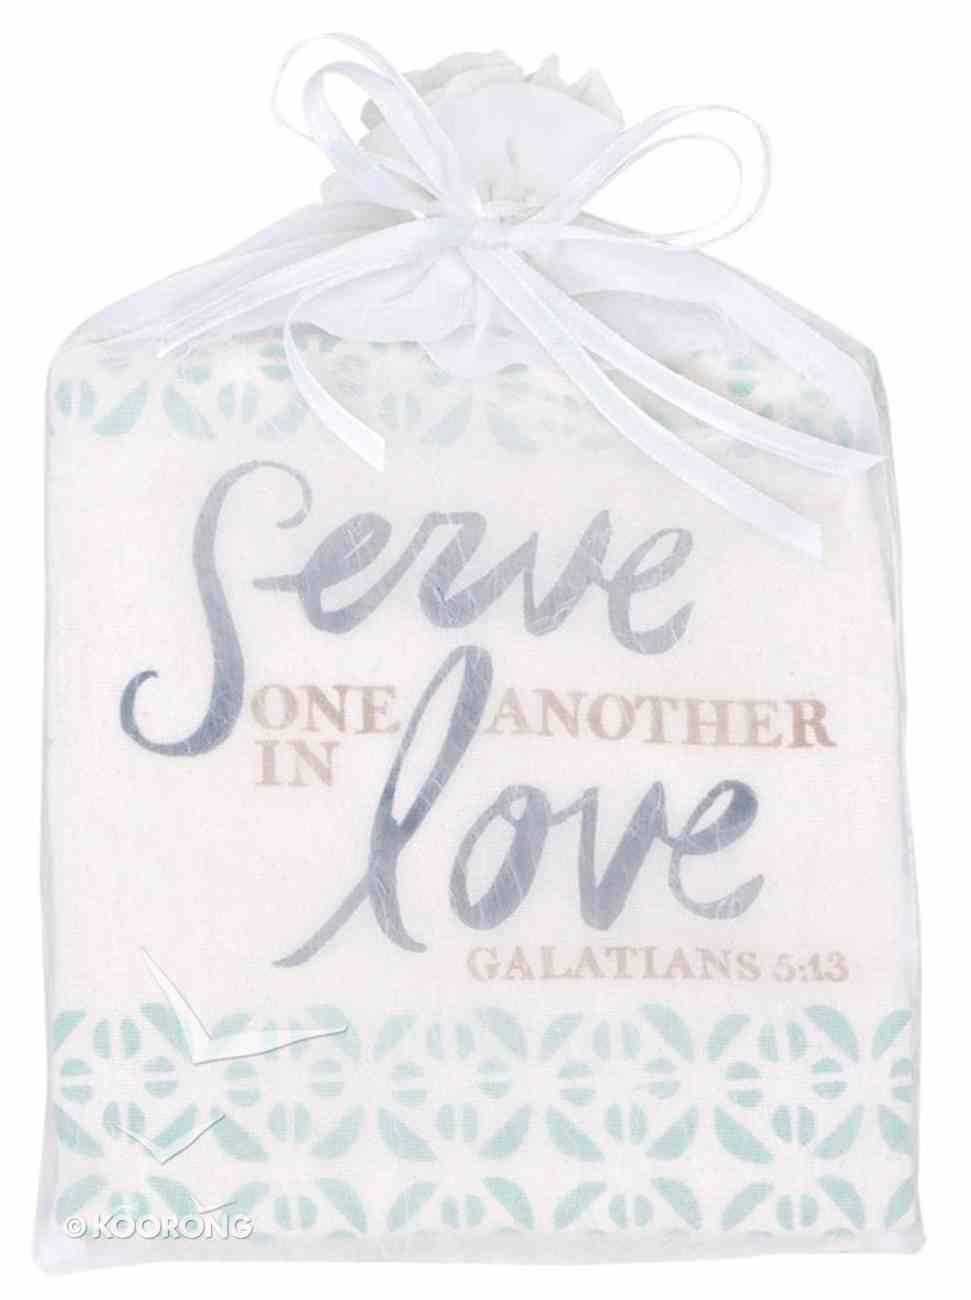 Tea Towel: Serve One Another, Cream/Mint Green (Gal 5:13) Homeware